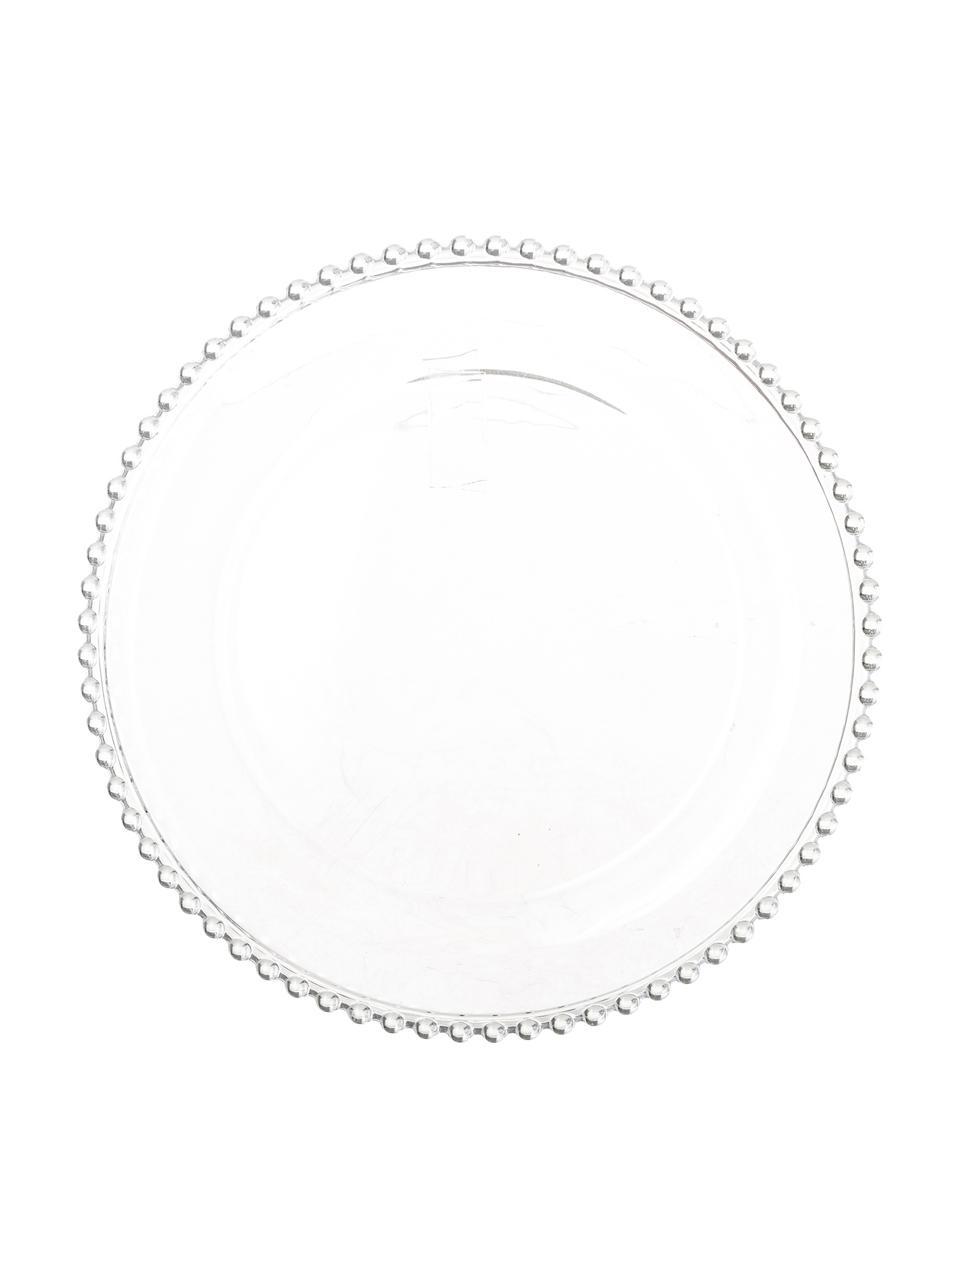 Piattino da dessert Perles 2 pz, Vetro, Trasparente, Ø 21 cm